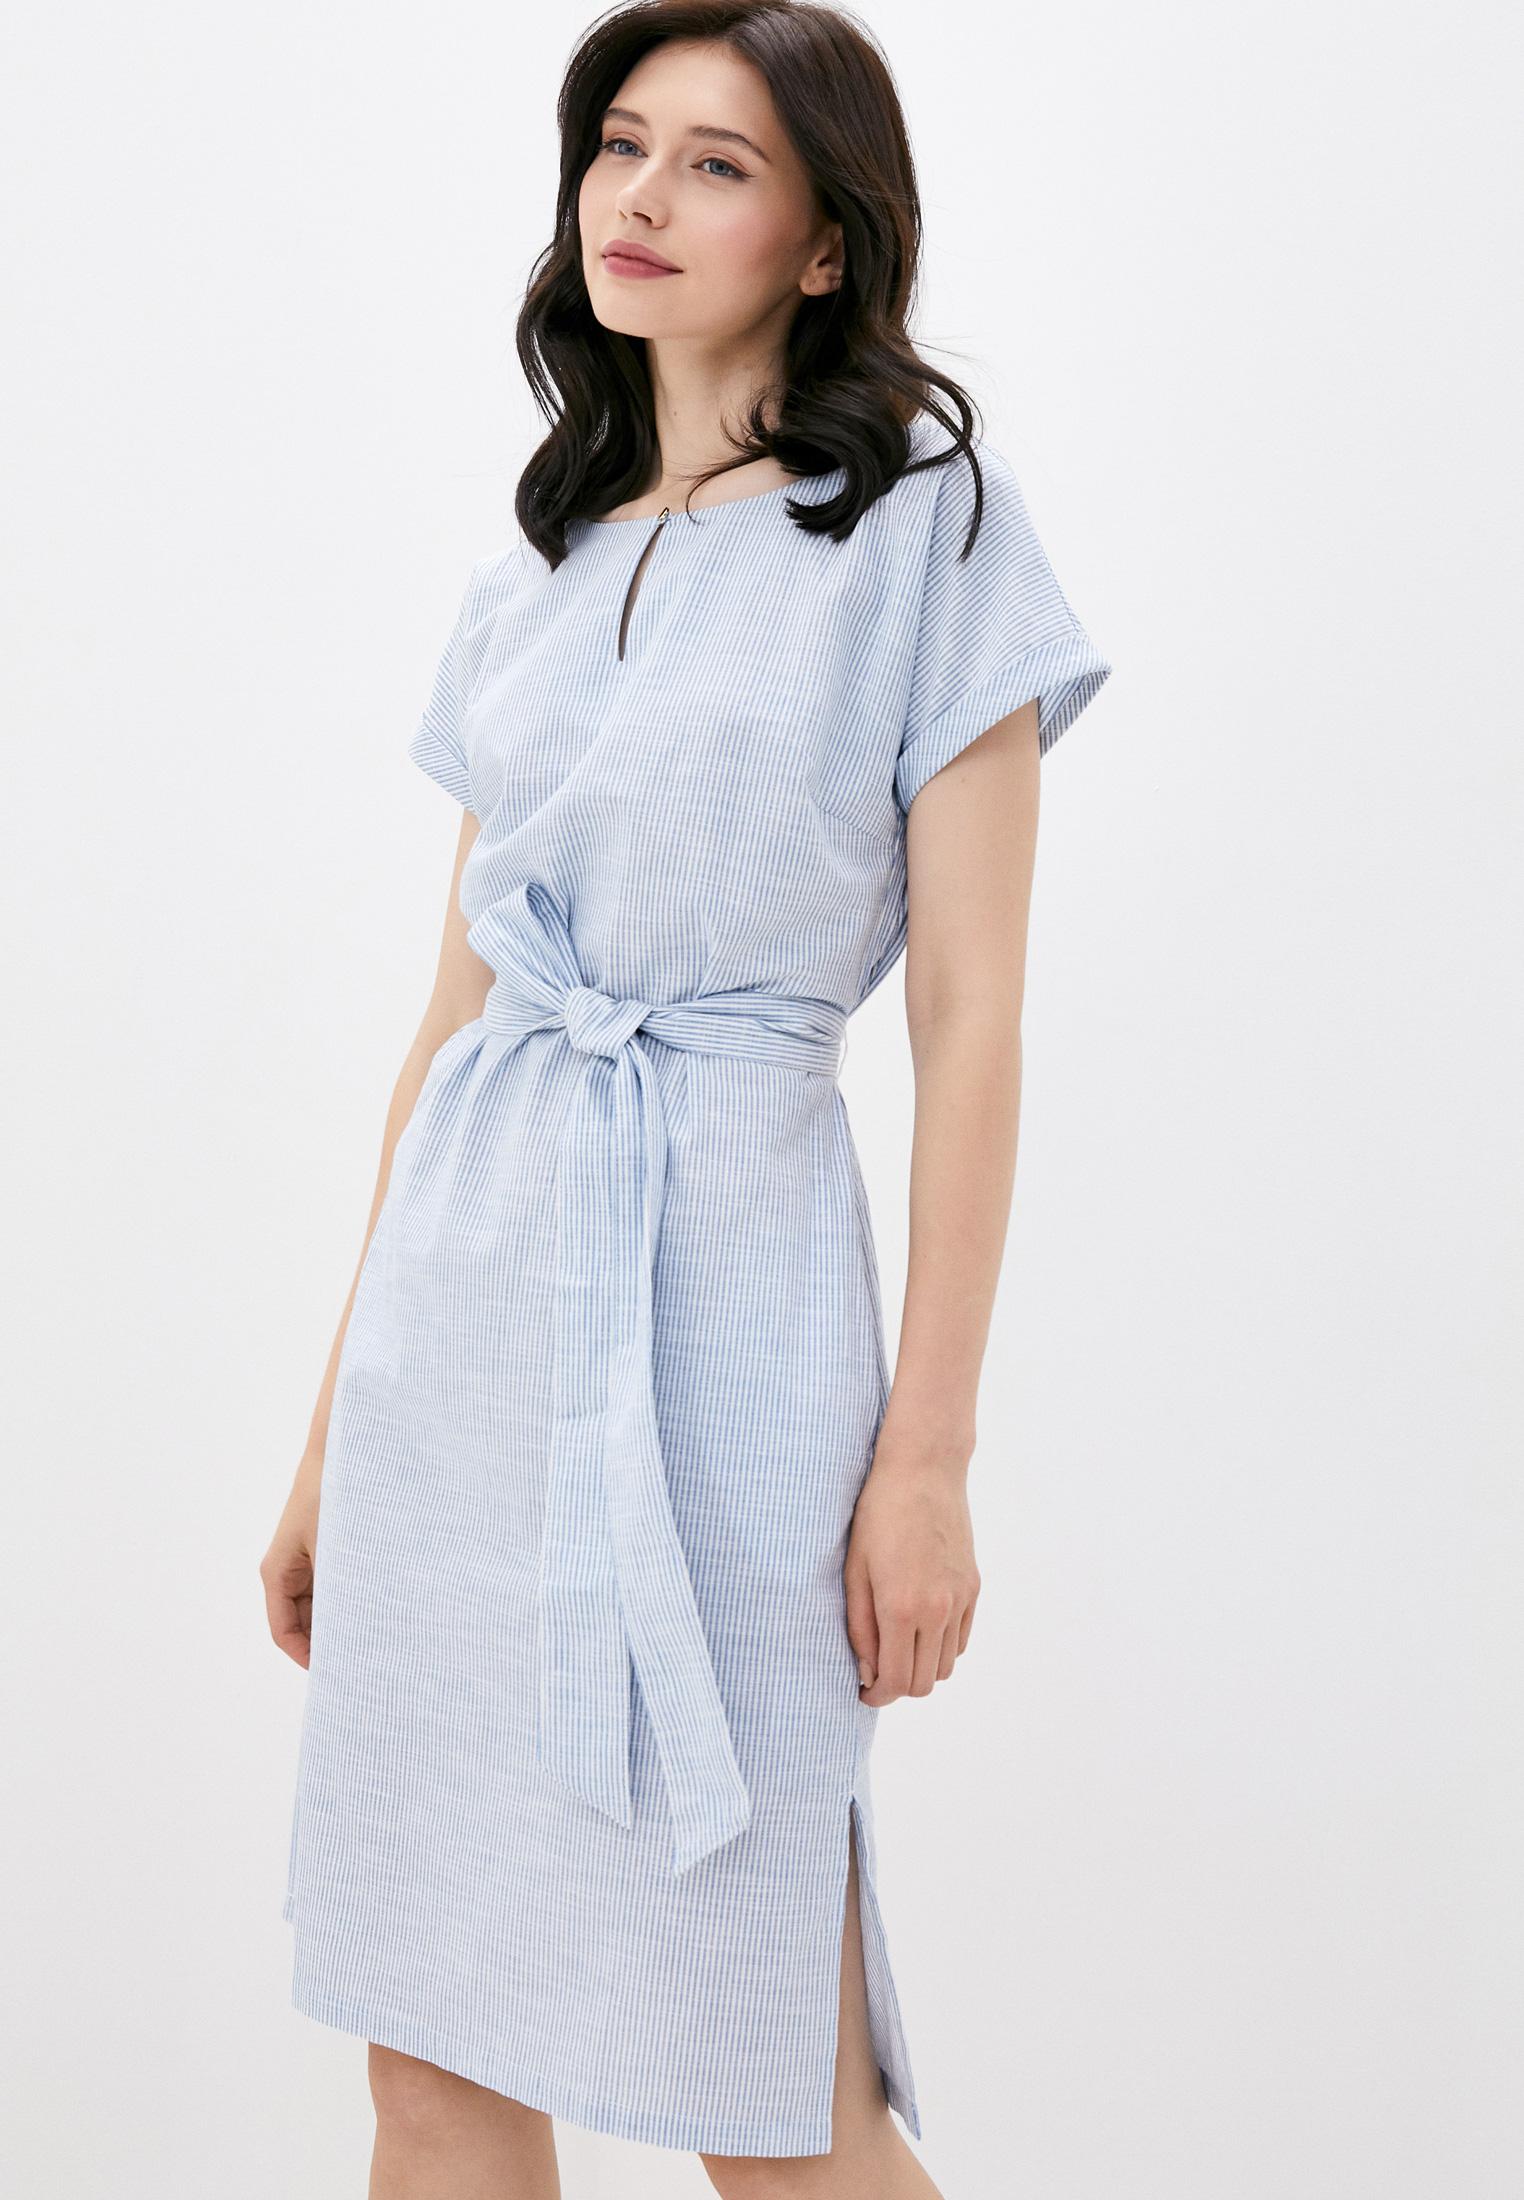 Повседневное платье Finn Flare (Фин Флаер) S19-14049